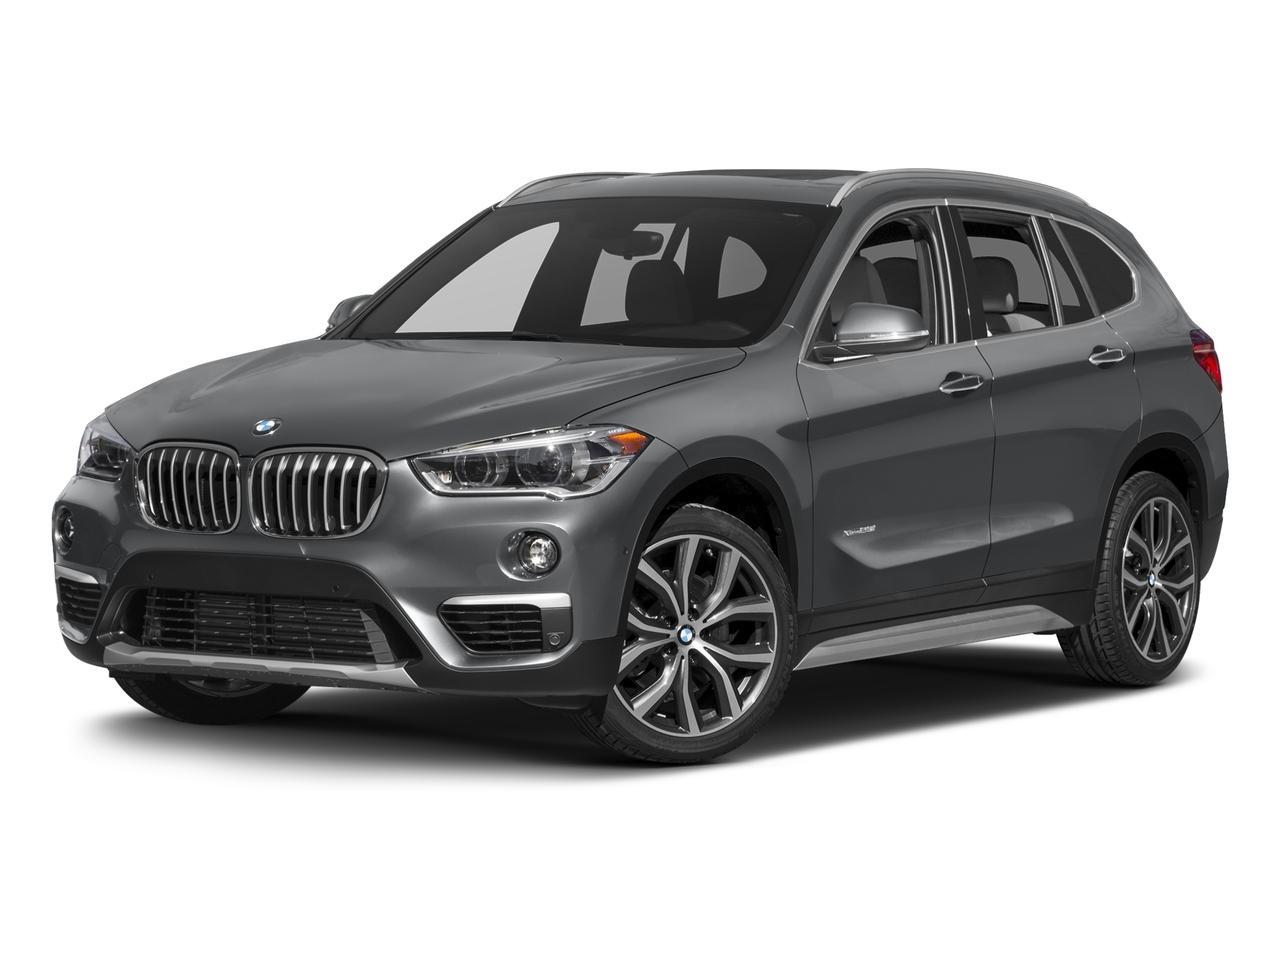 2017 BMW X1 xDrive28i Vehicle Photo in Tulsa, OK 74133